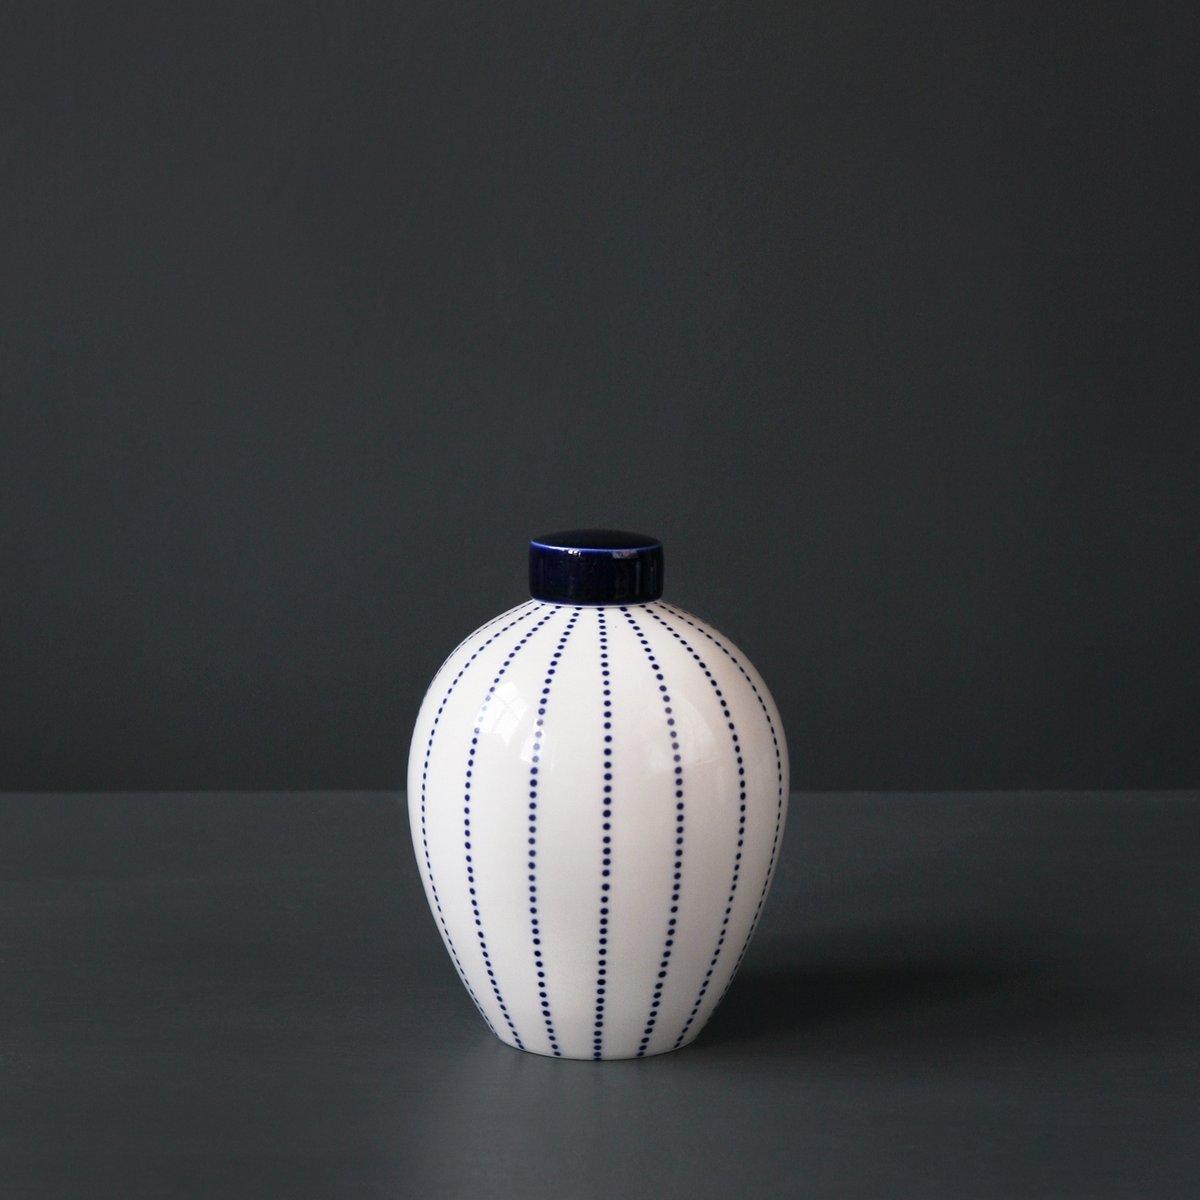 Image of 'Dotty' Ginger Jar by Rhian Malin.